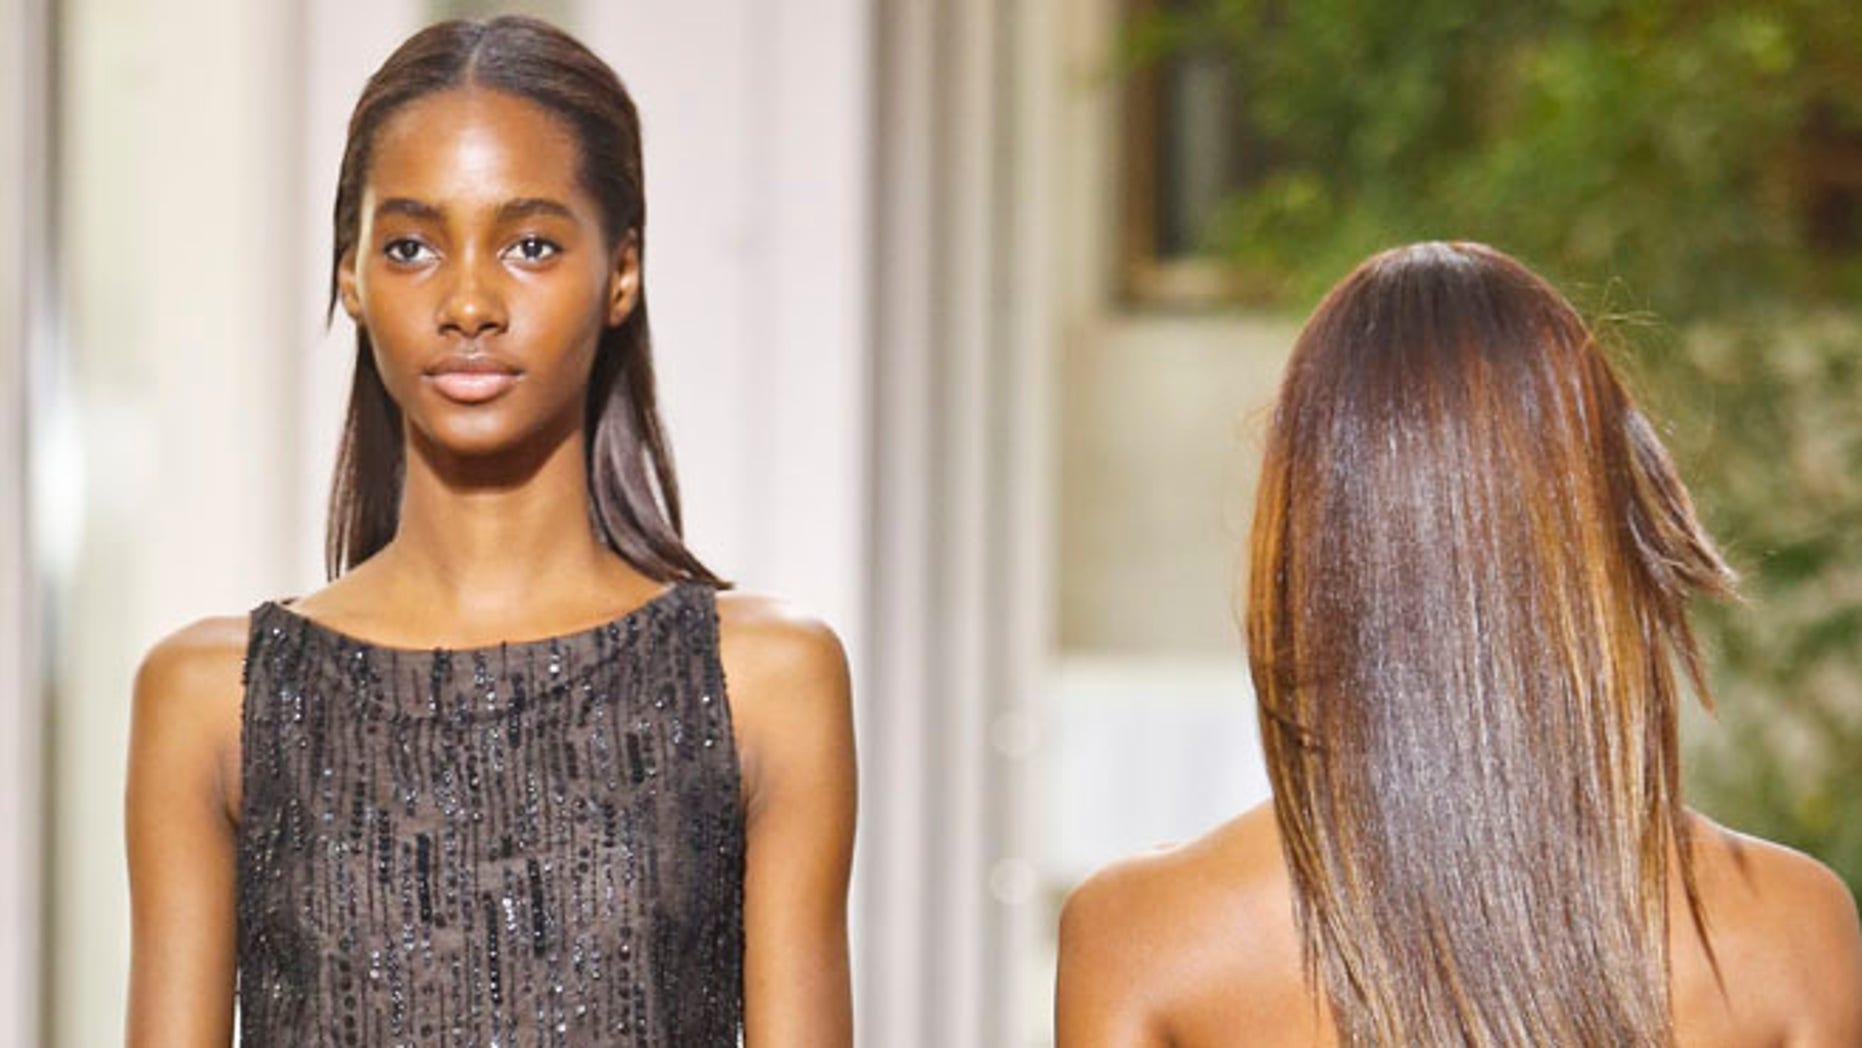 Fashion from the Oscar de la Renta Spring 2017 at NY Fashion Show on Monday Sept. 12, 2016.